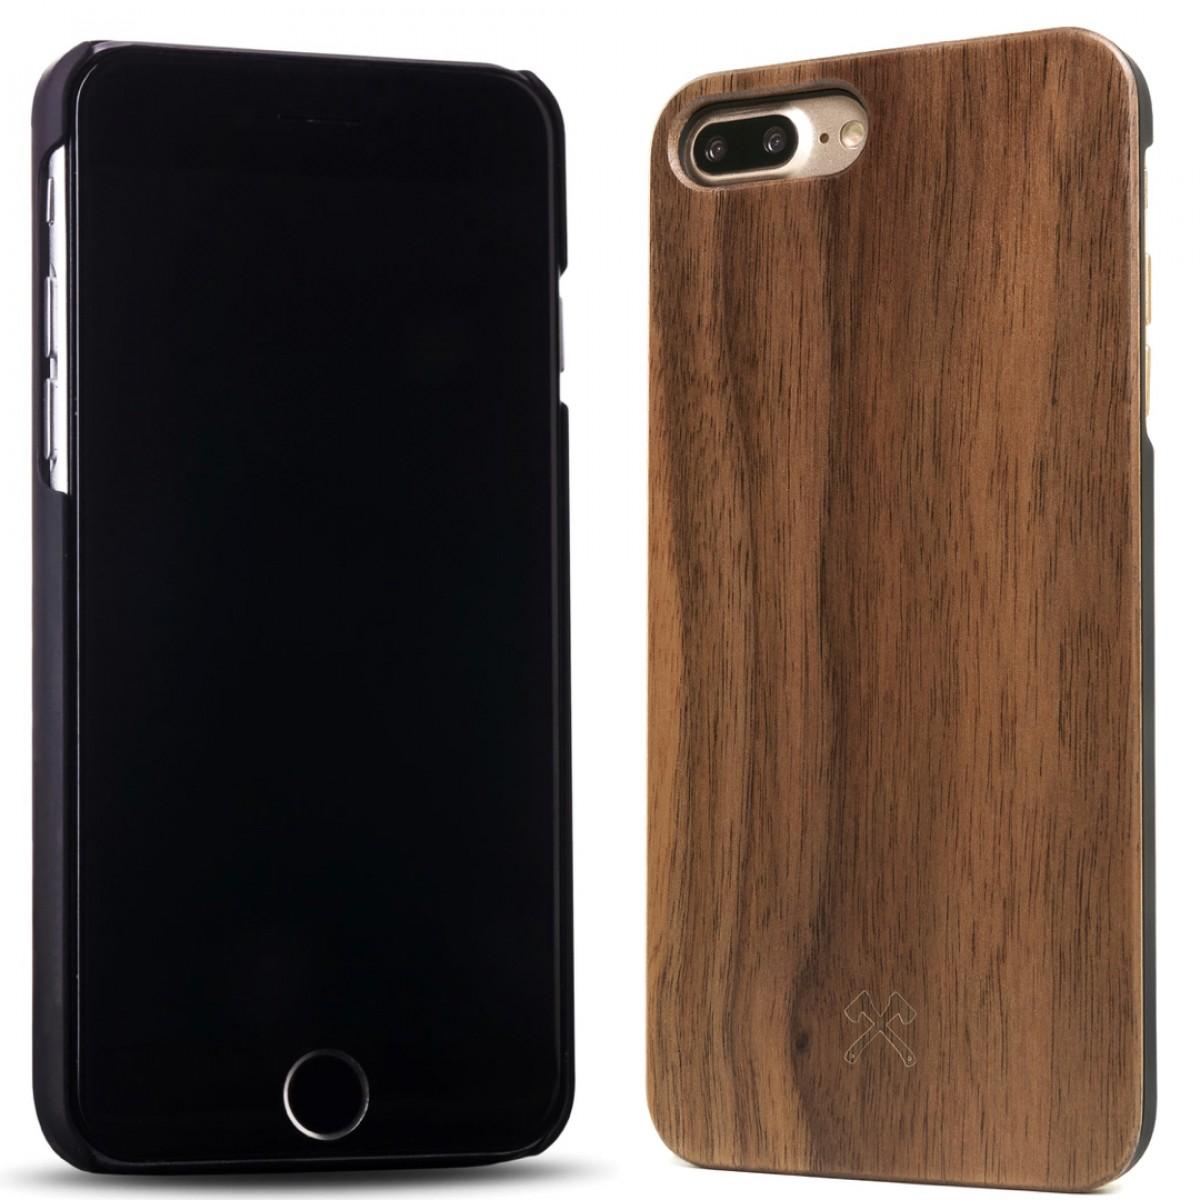 Woodcessories - EcoCase Classic - Premium Design Case, Cover, Hülle für das iPhone aus FSC zert. Holz (iPhone 7 Plus/ 8 Plus, Walnuss, Kirsche, Bambus / schwarz)